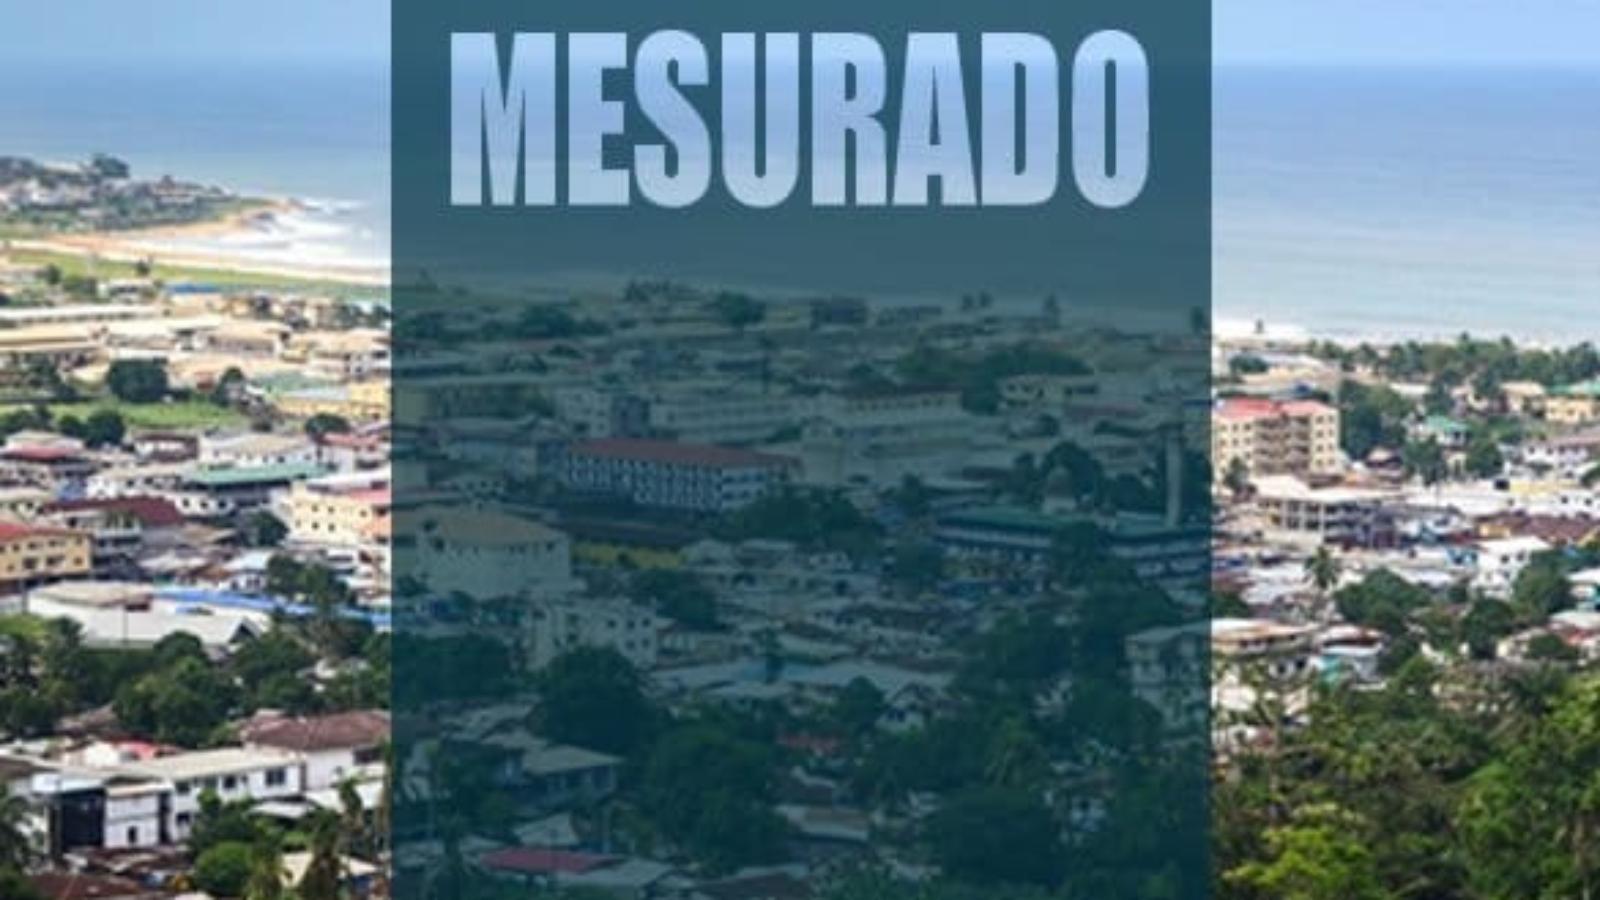 Cape Mesurado